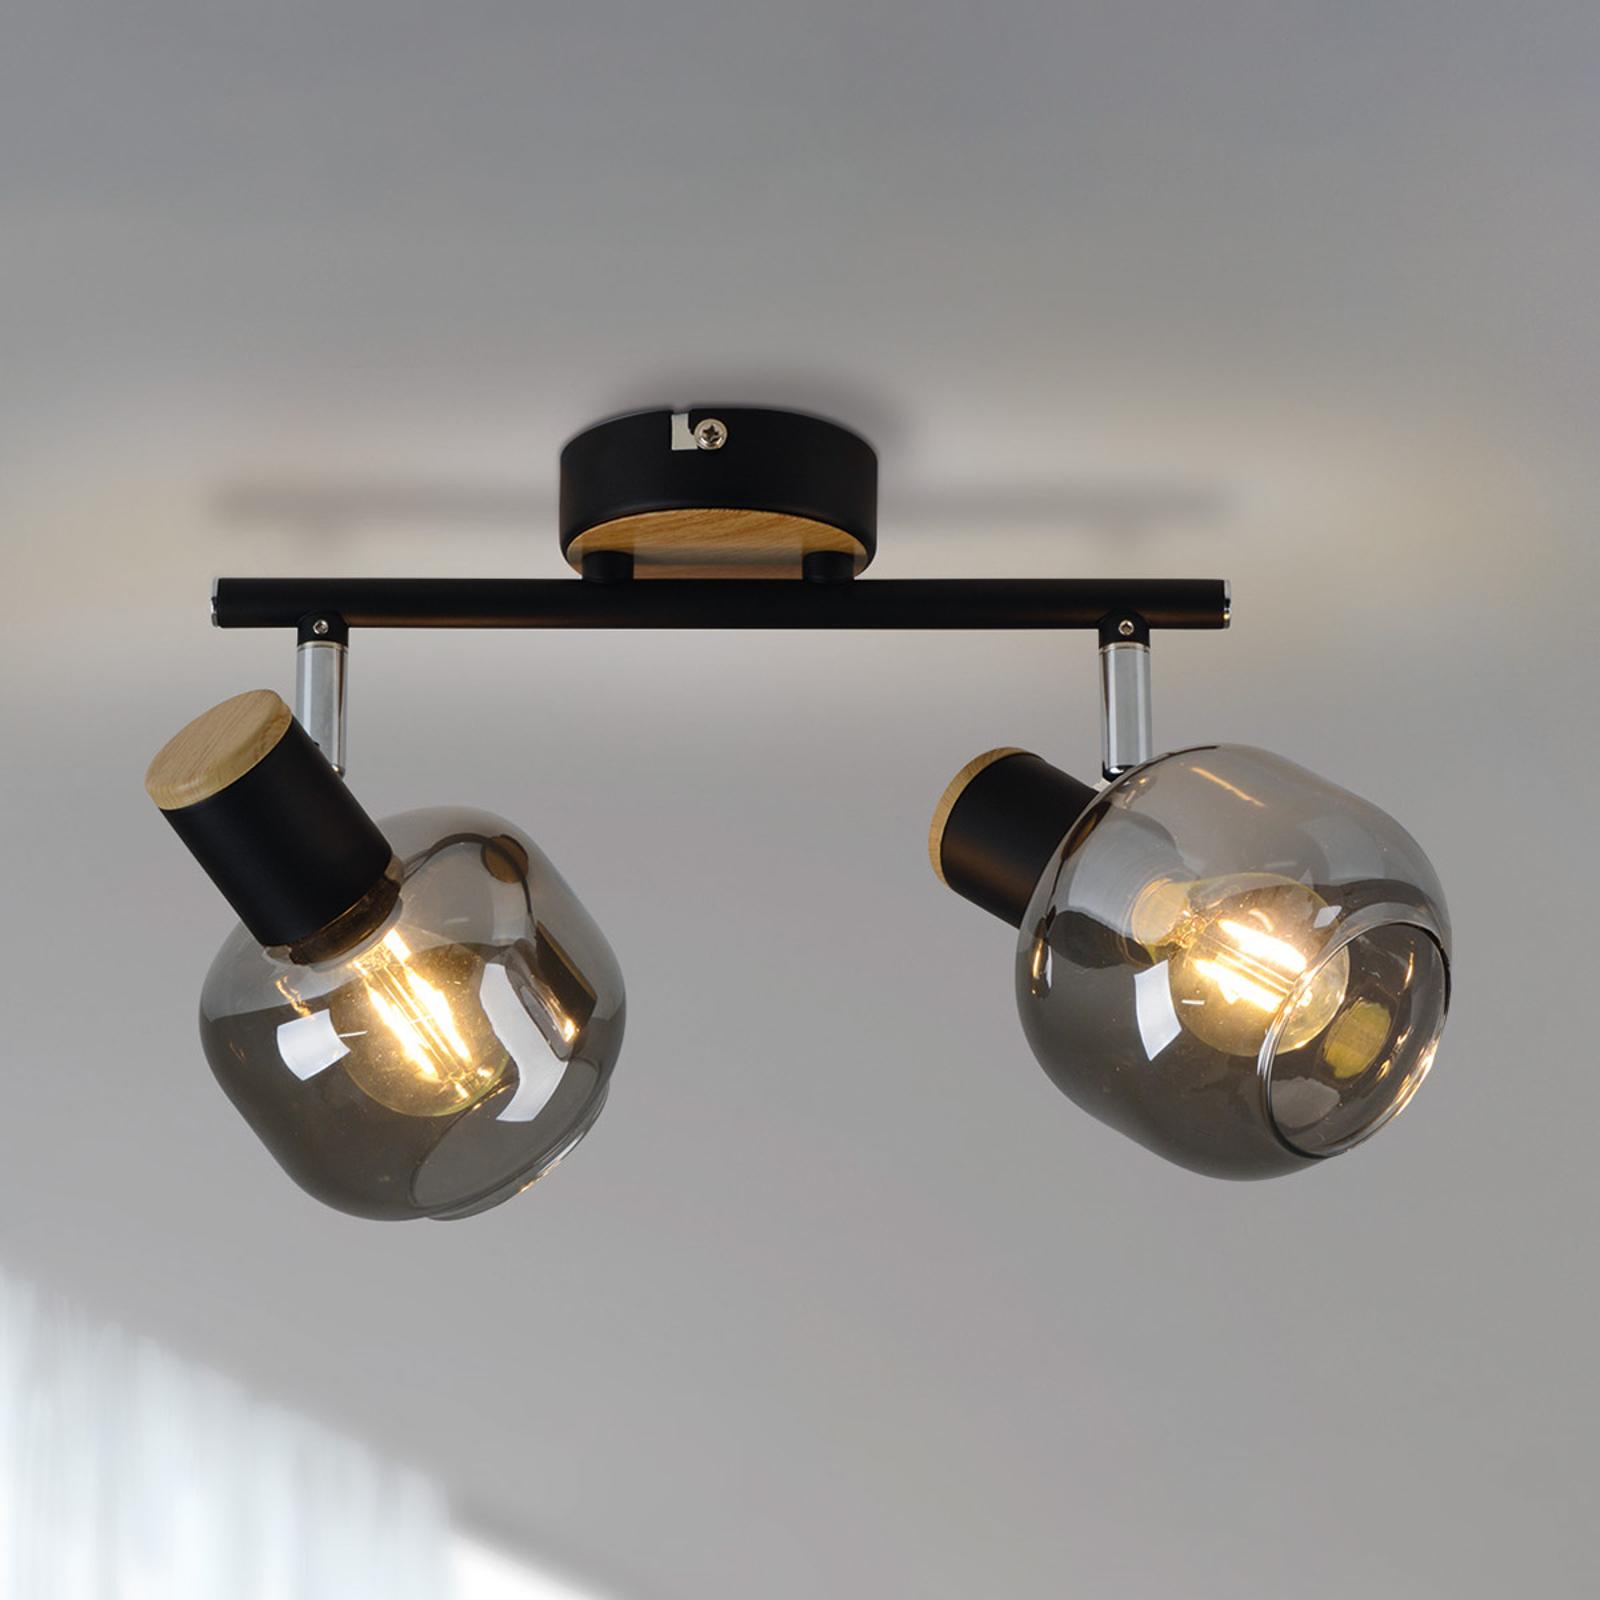 1350122 taklampe med røykglass, 2 lyskilder